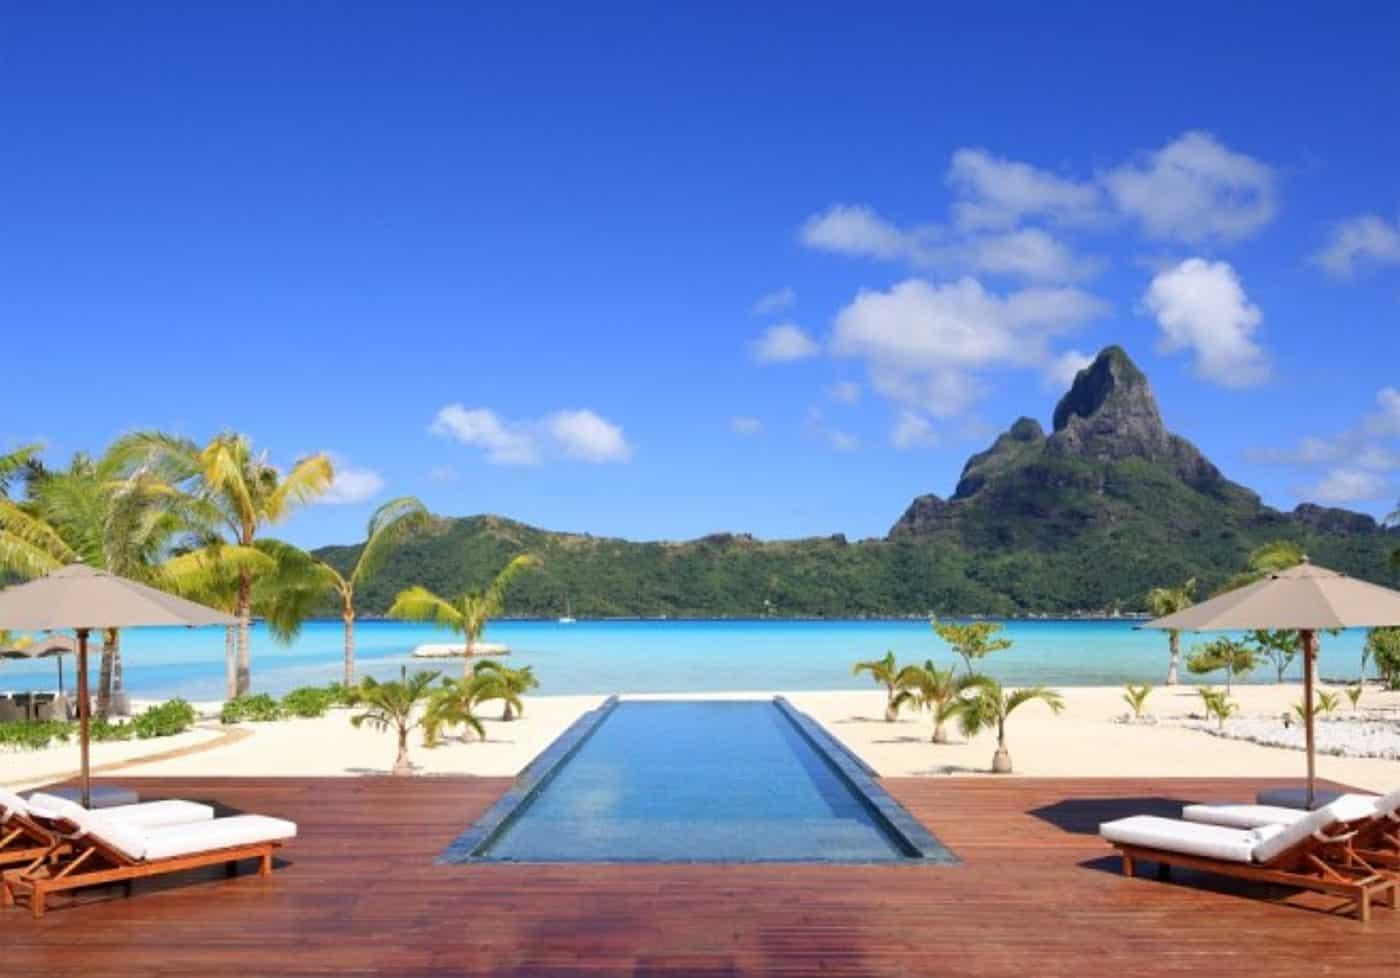 Incredible view of the pool and Mt Otemanu from Bora Bora One Resort | boraboraphotos.com